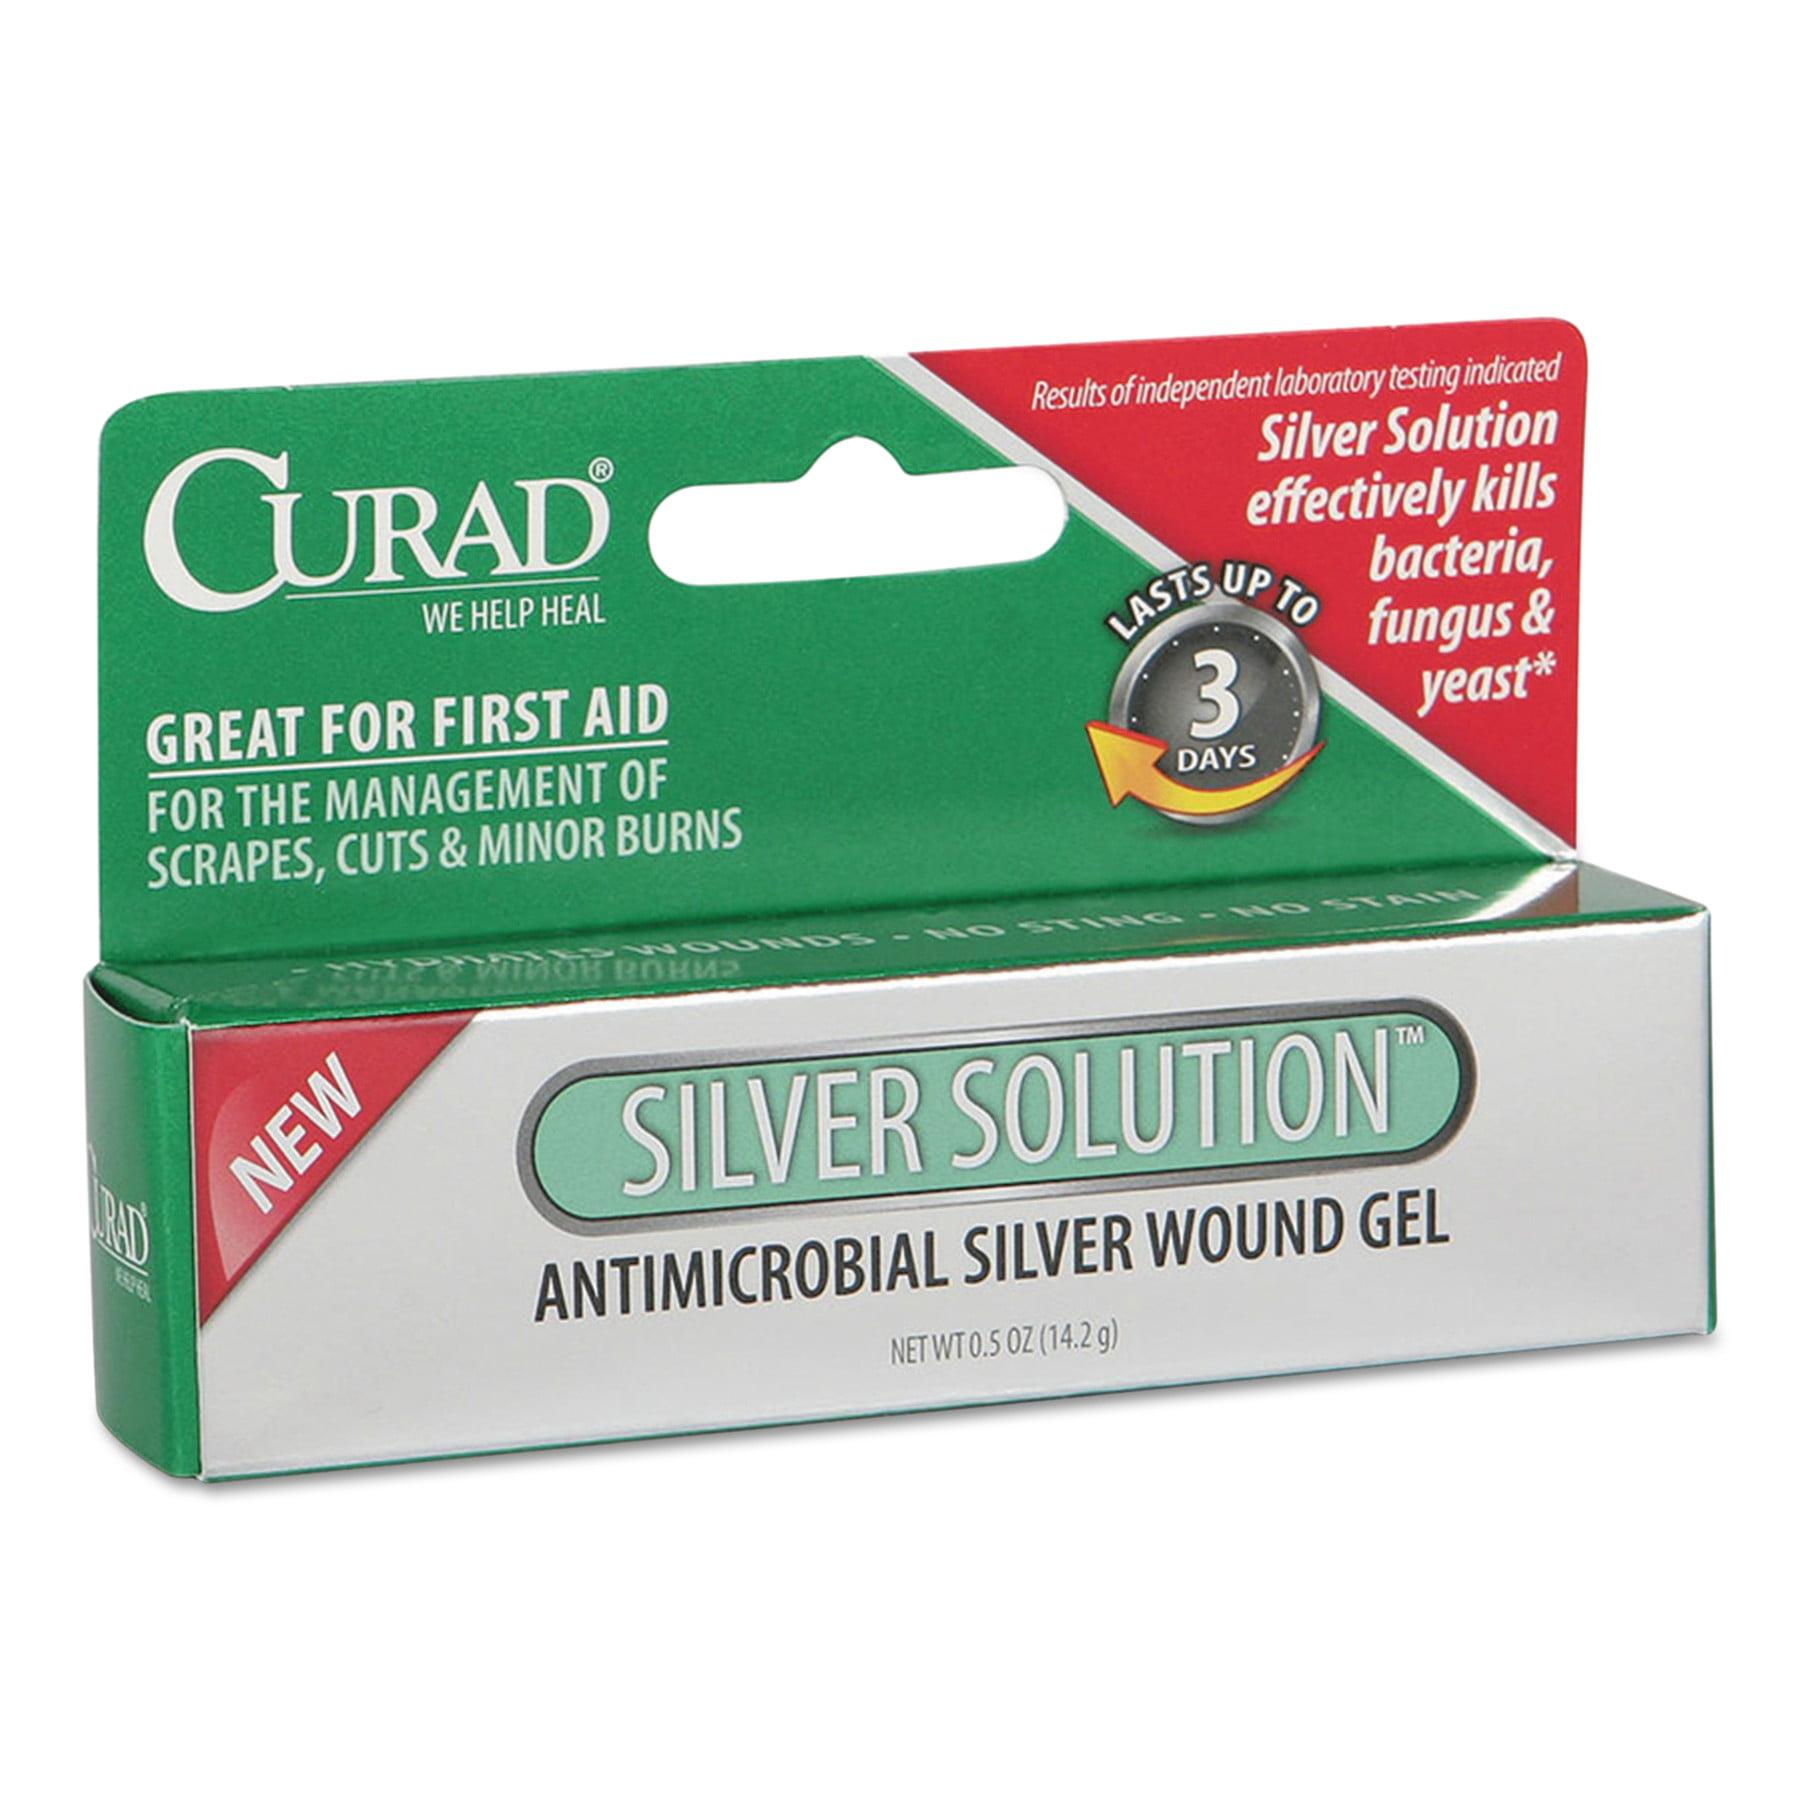 Curad Silver Solution Antimicrobial Gel, .5oz Tube